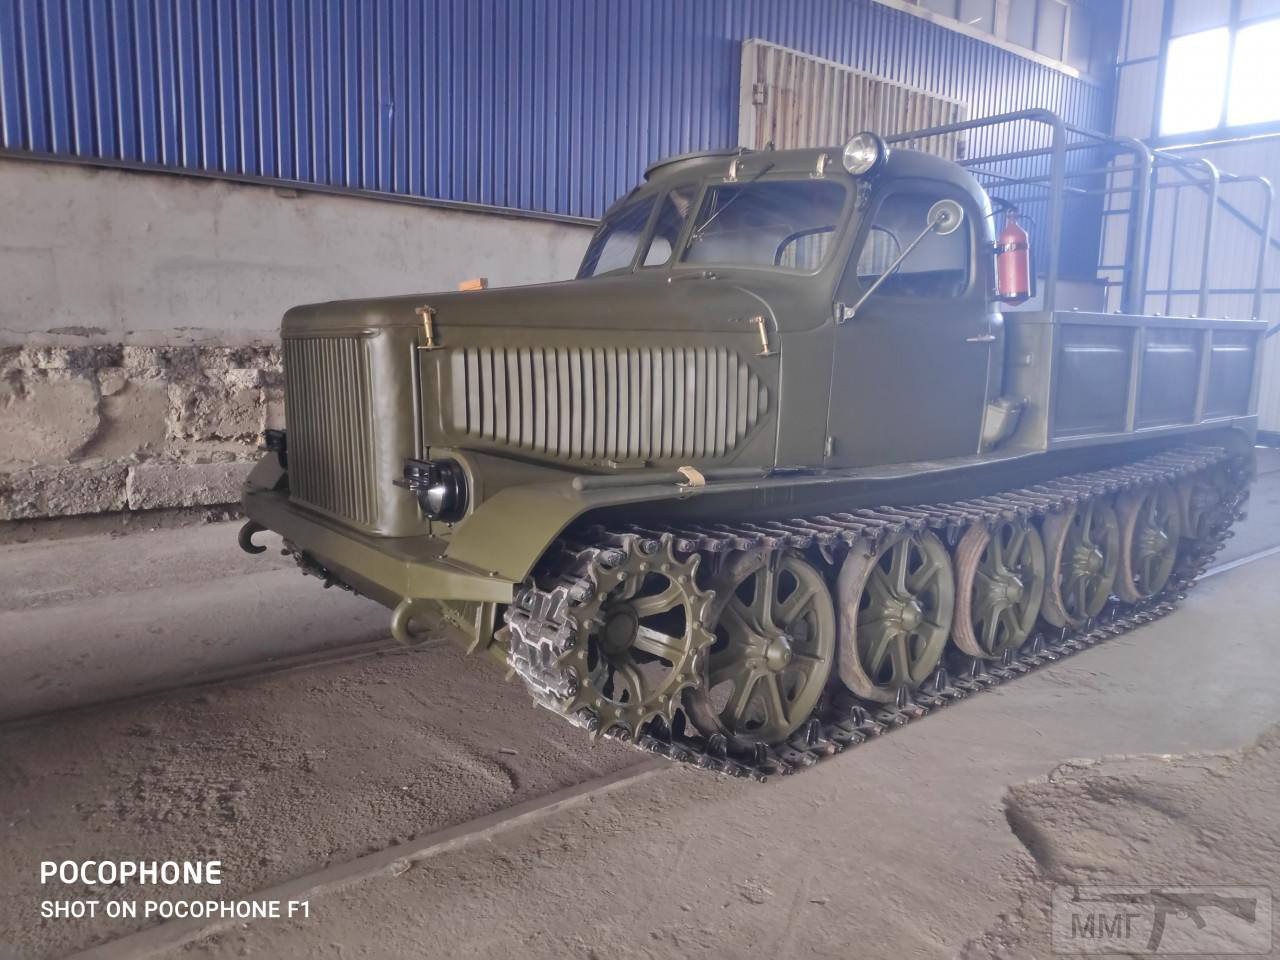 110208 - Музей техники Фаэтон в г. Запорожье